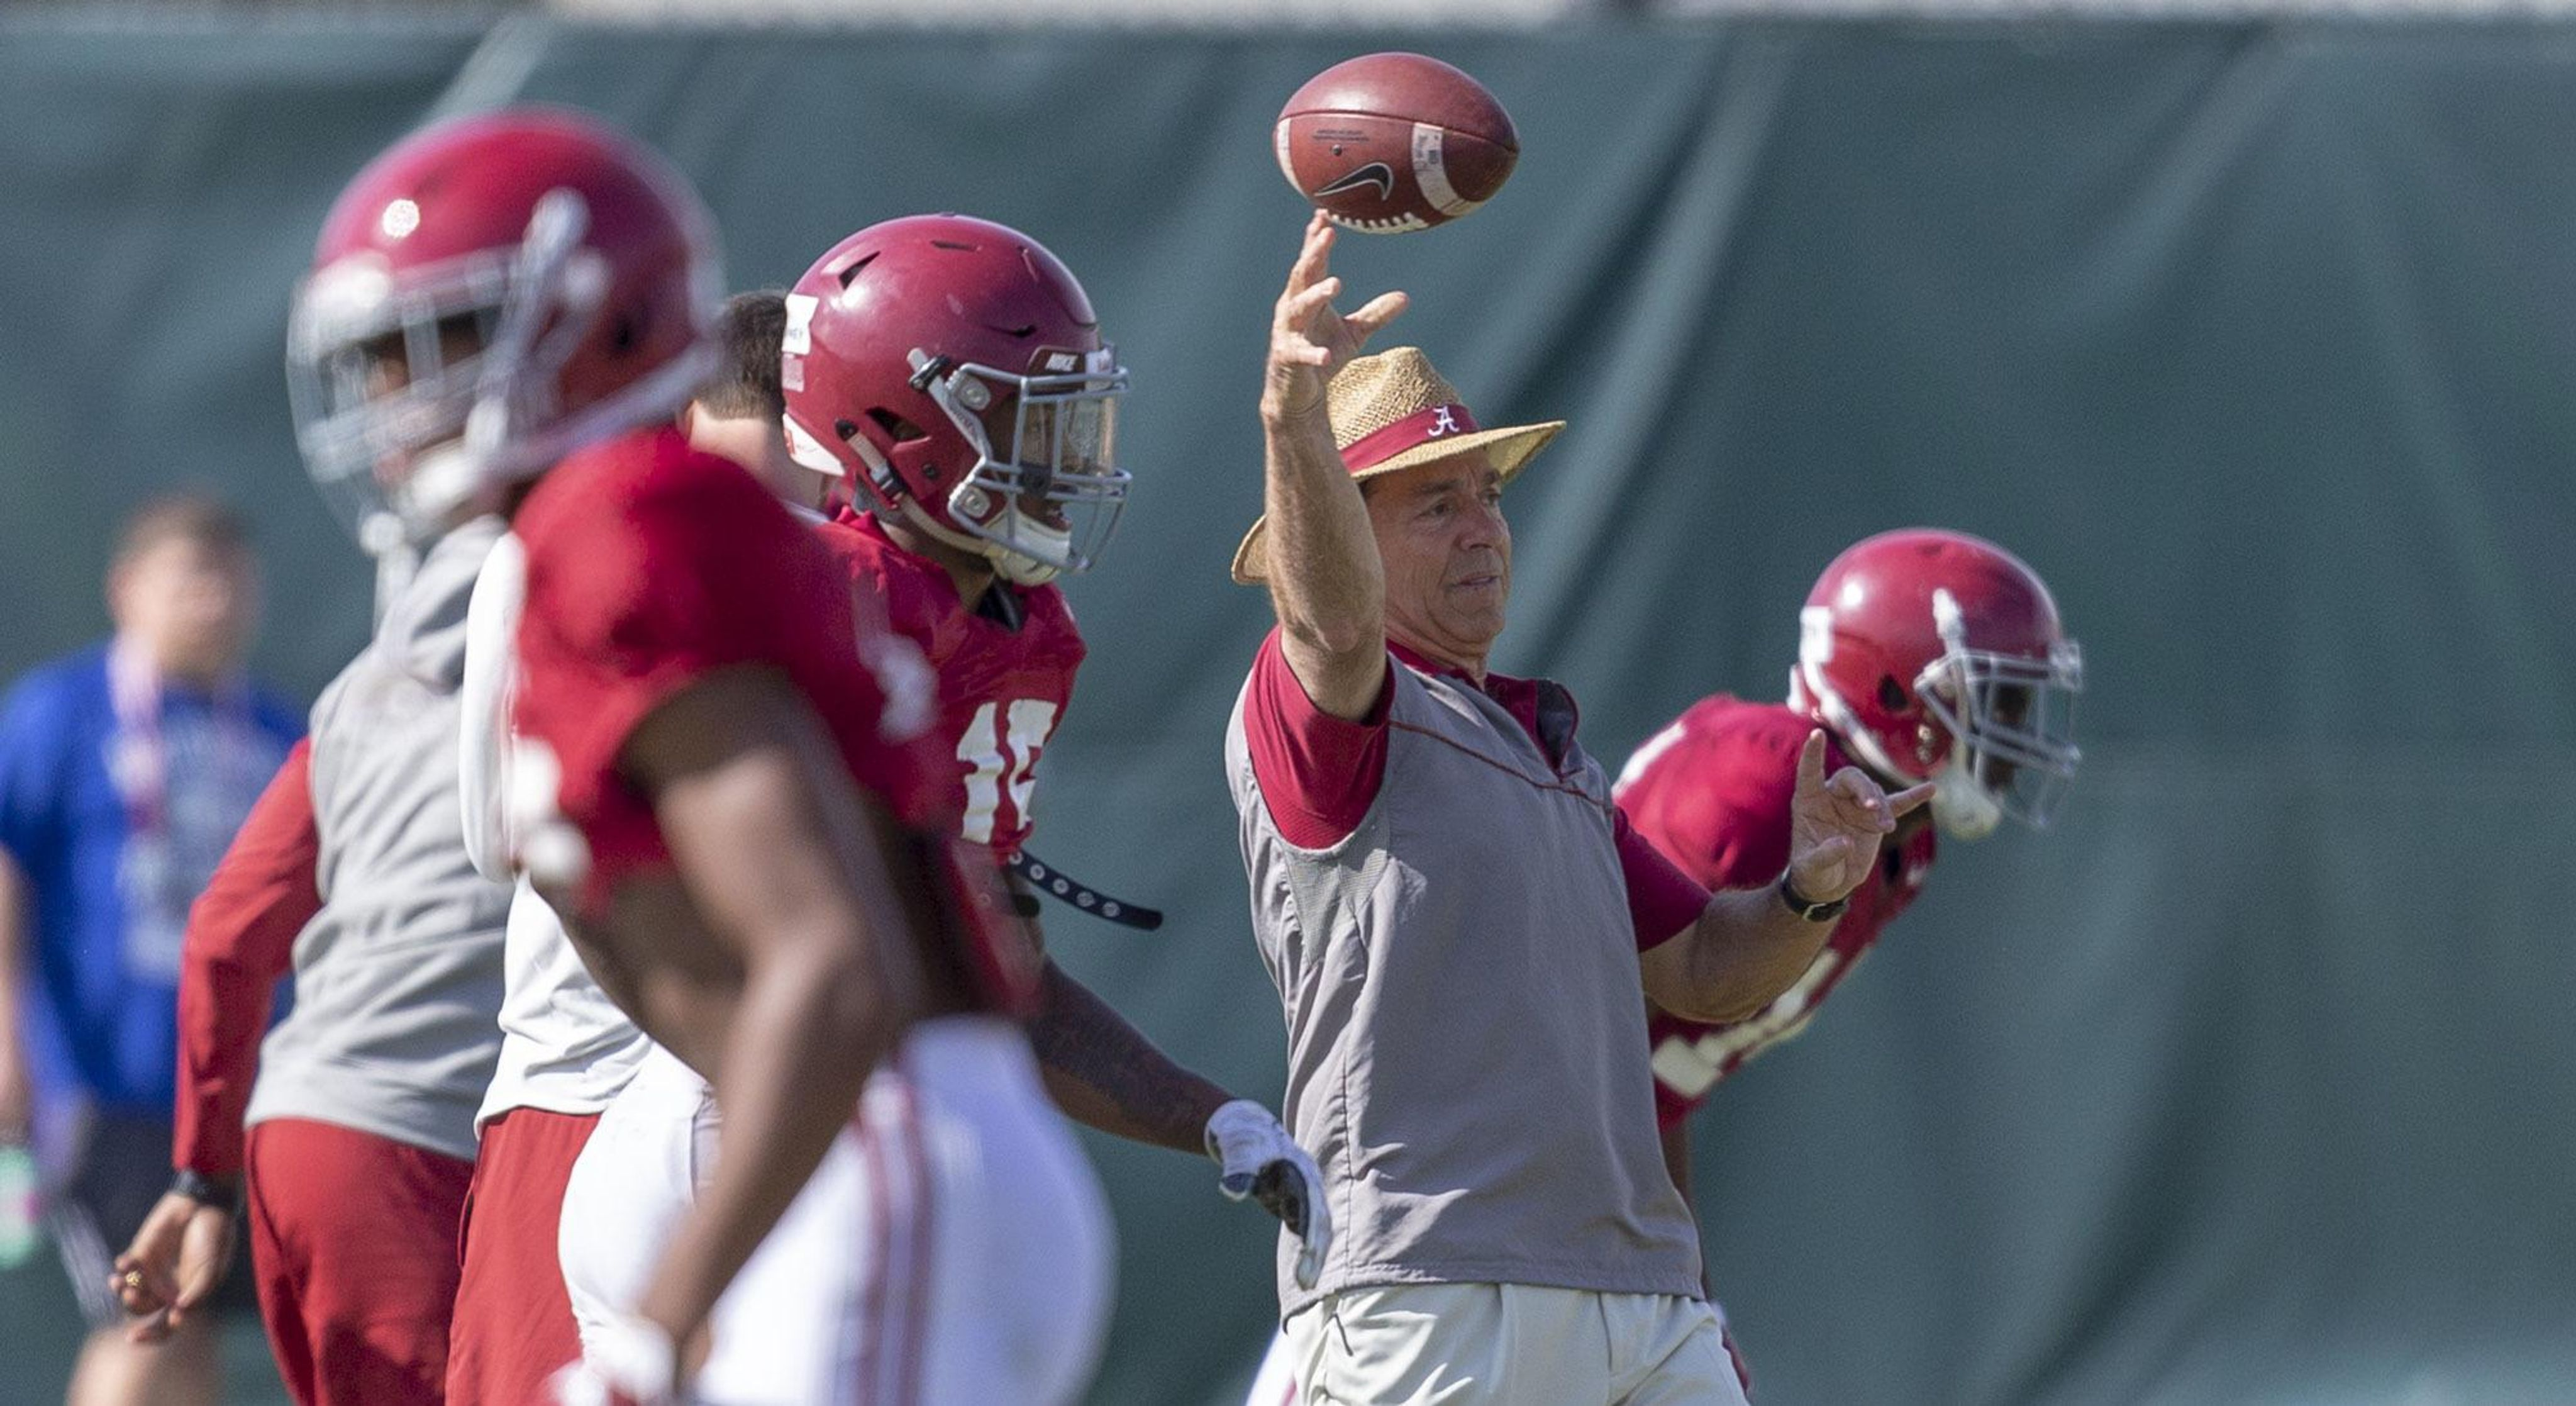 Alabama_practice_football_41895_s4096x2235